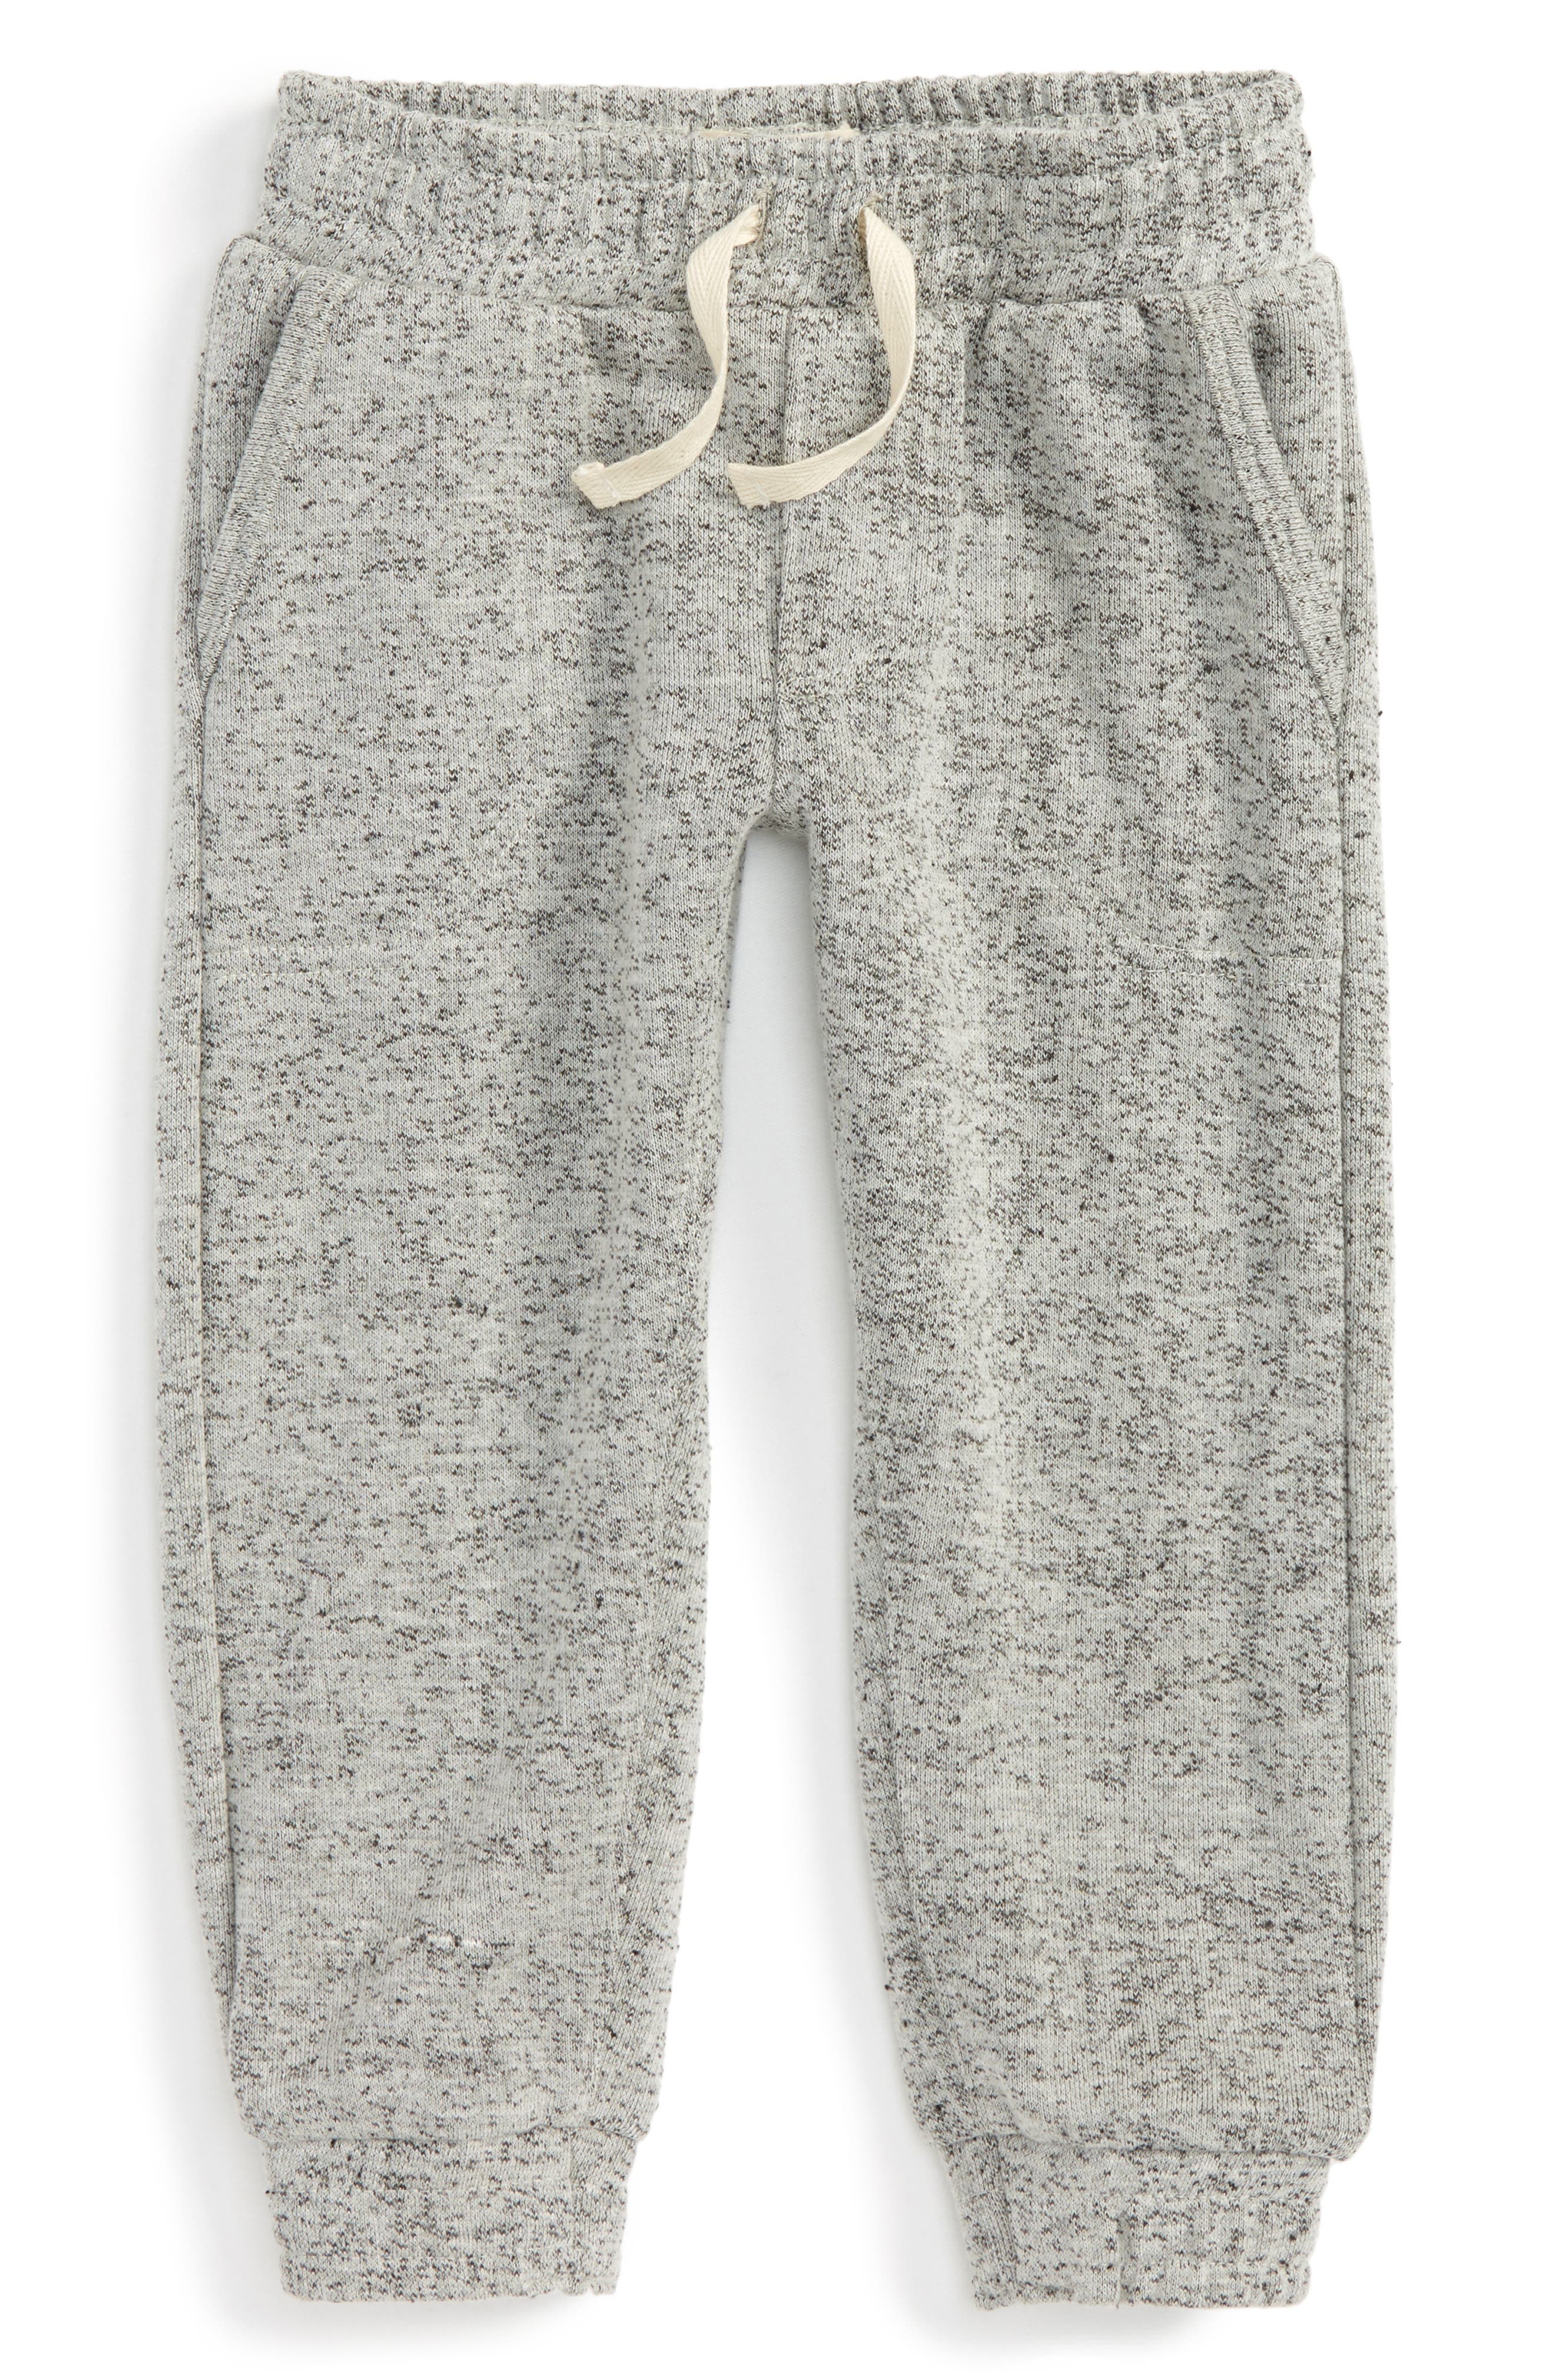 Alternate Image 1 Selected - Peek Knit Jogger Pants (Toddler Boys, Little Boys & Big Boys)